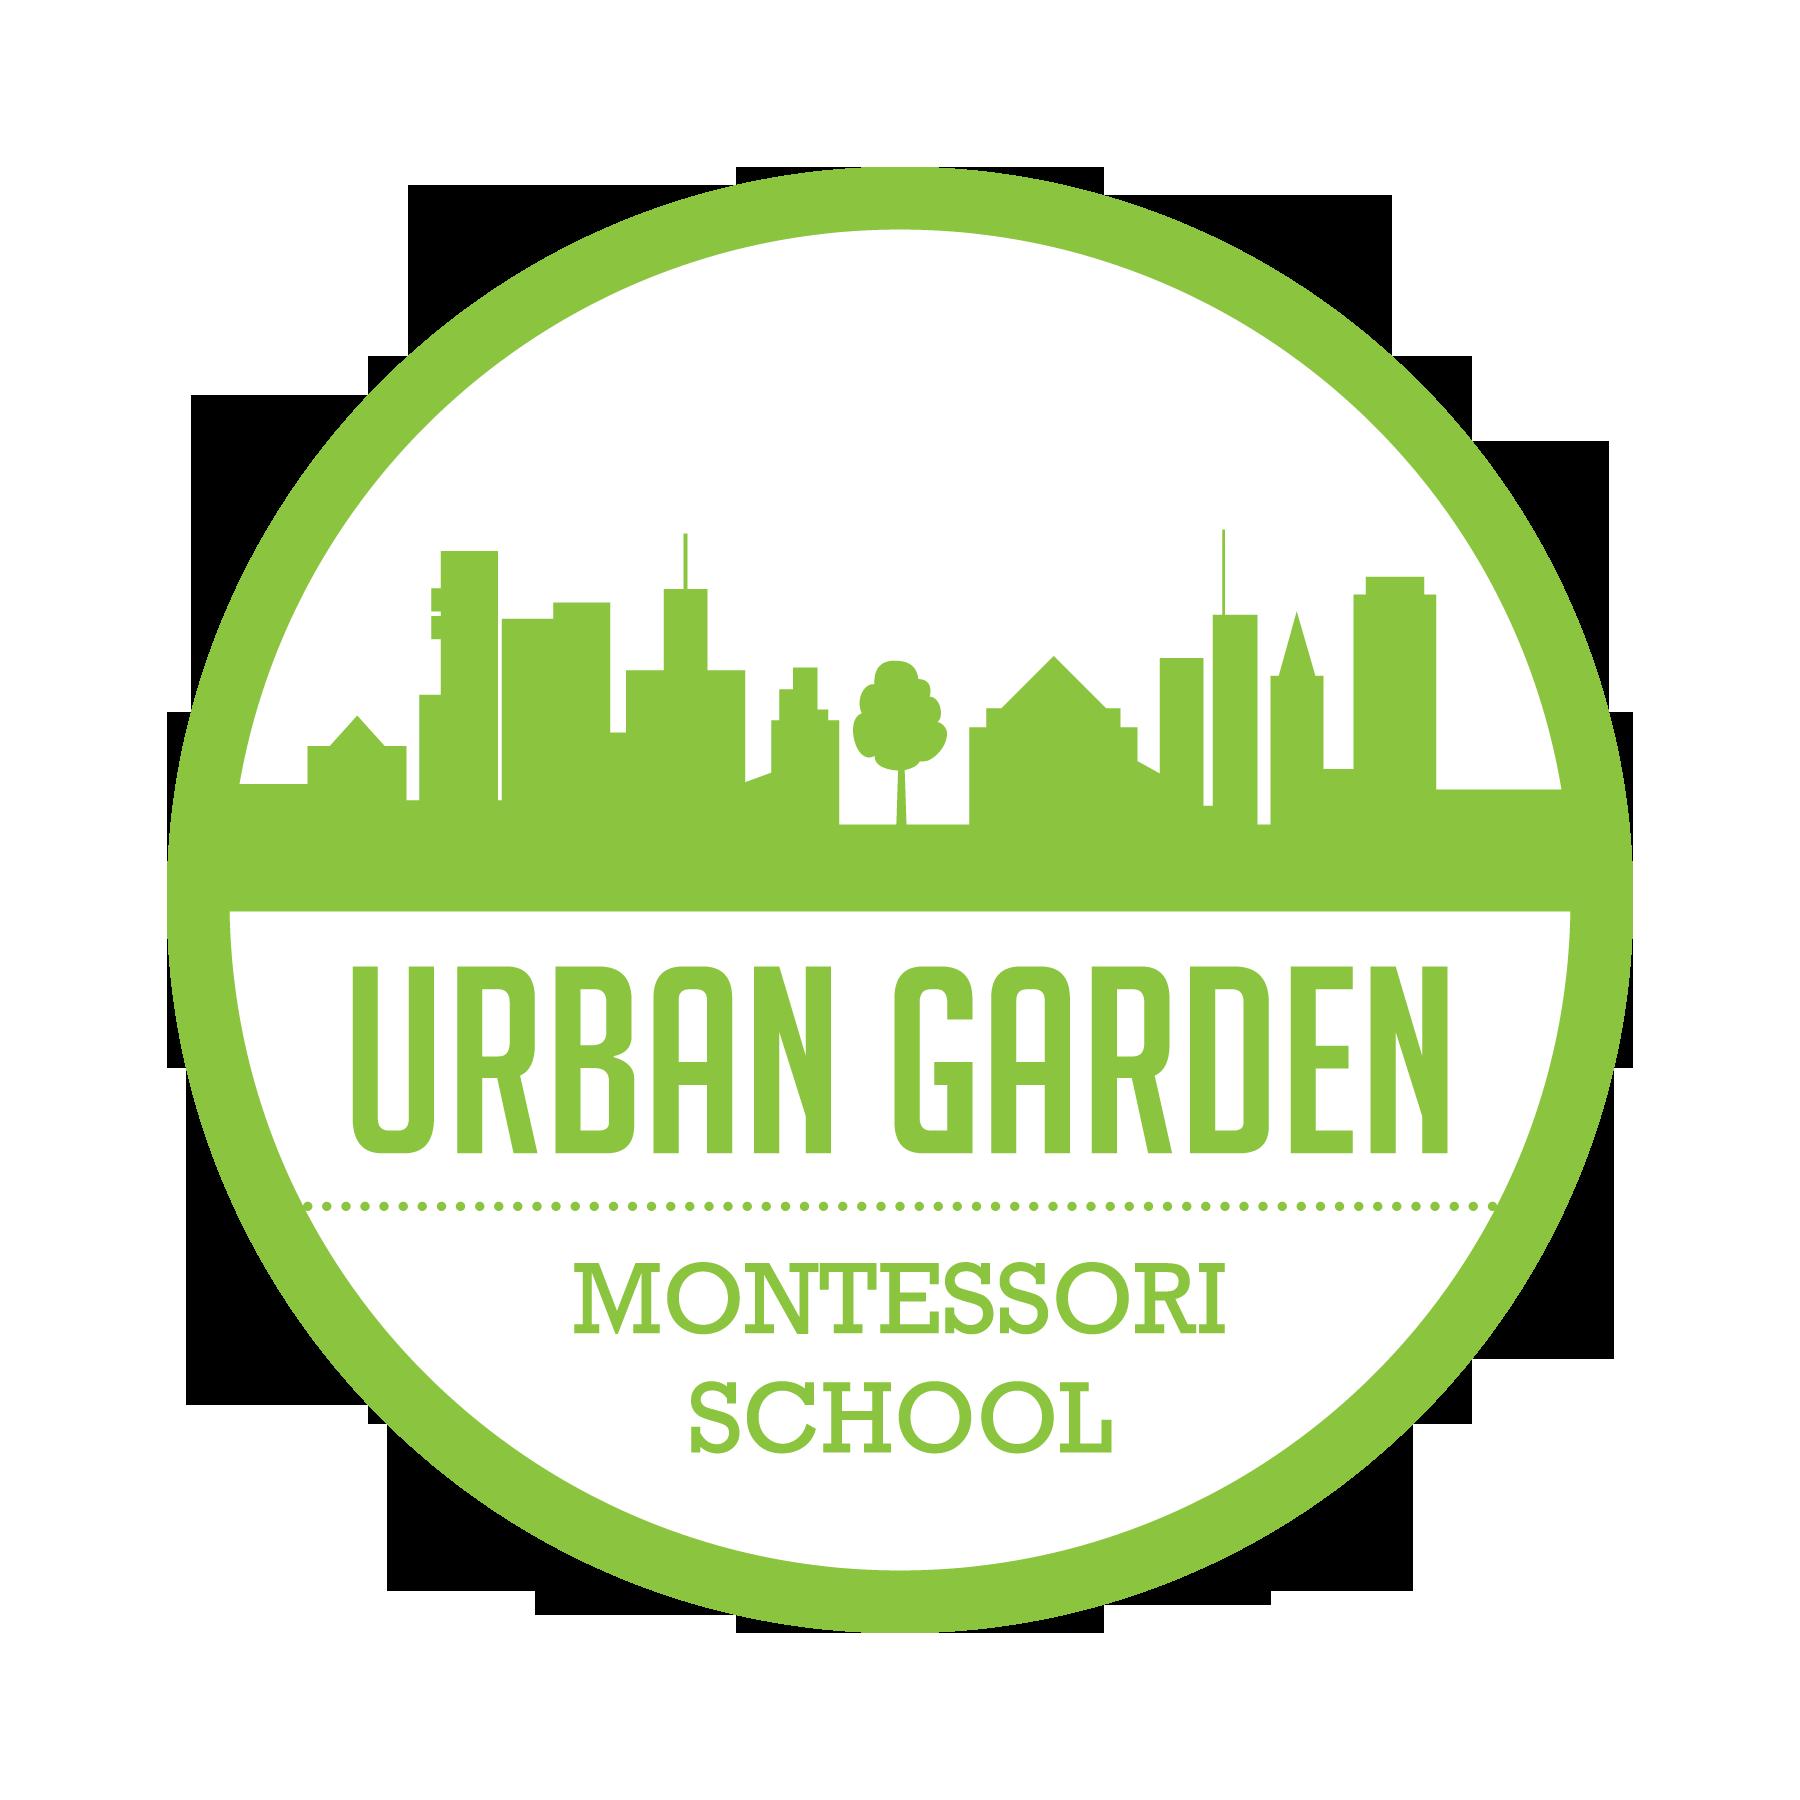 Urban Garden Montessori